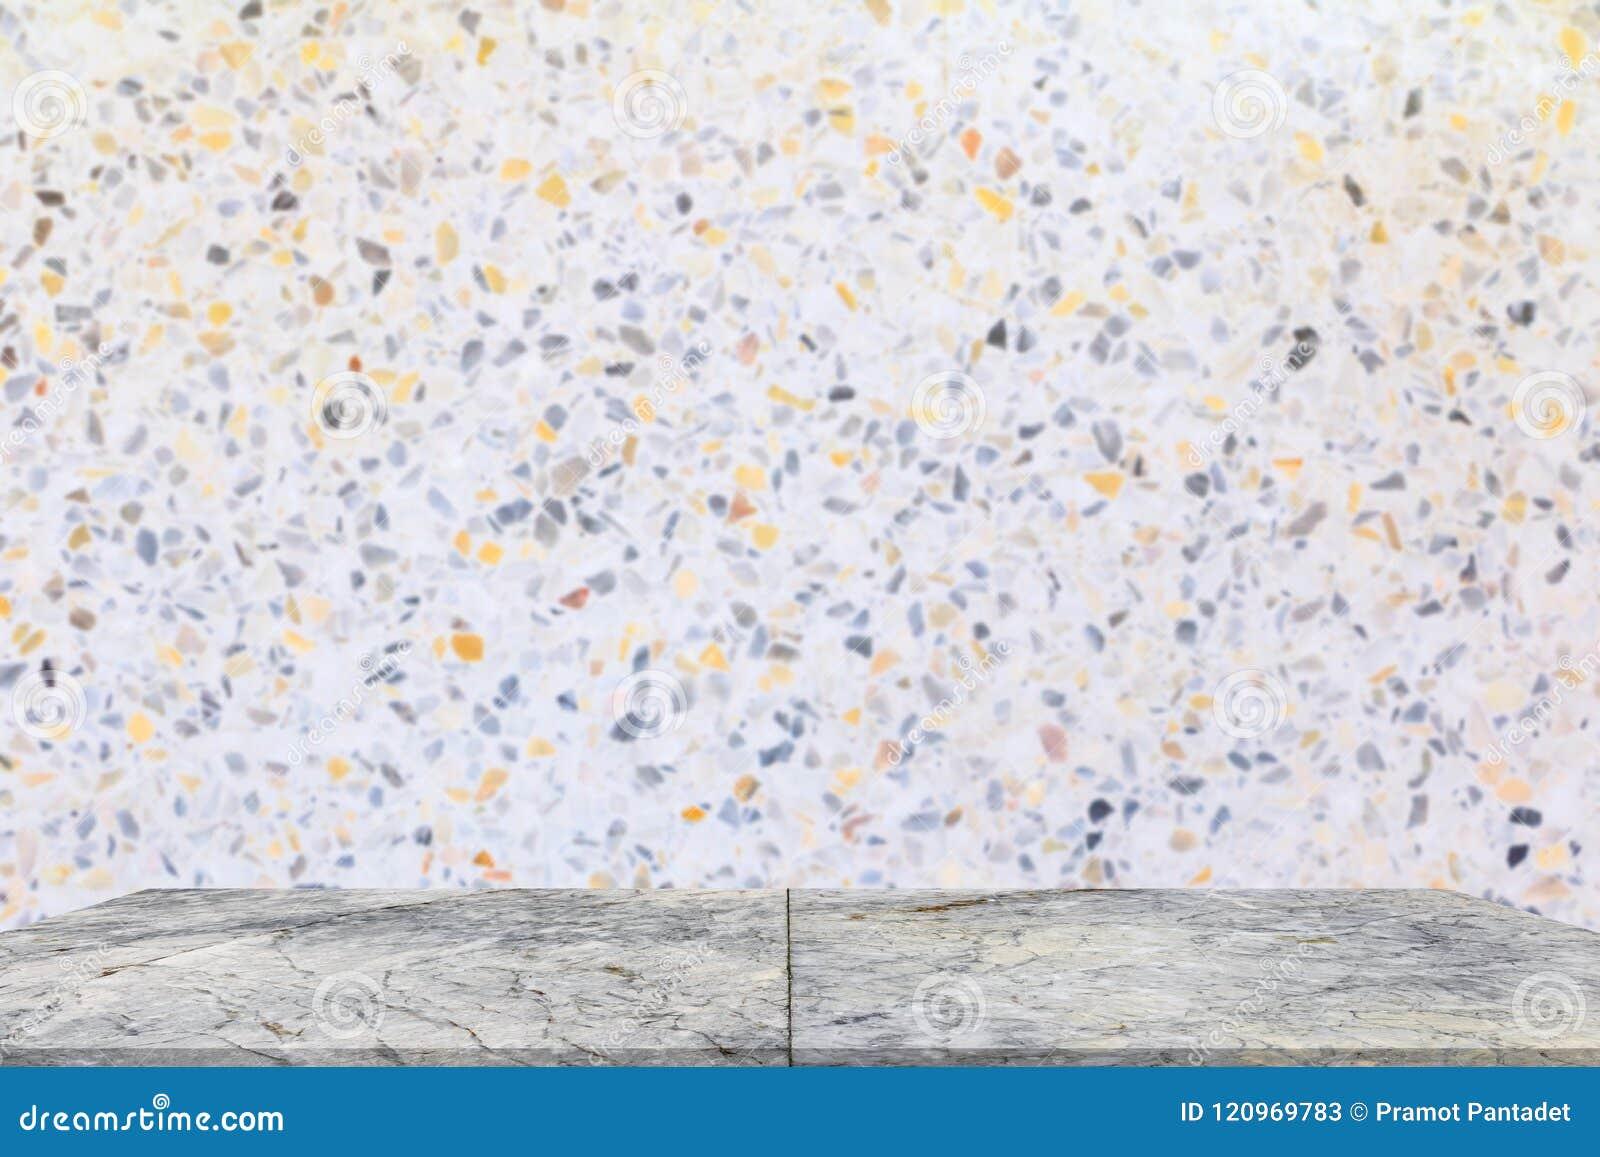 Shelves Marble Design Terrazzo Flooring Beautiful Stone On